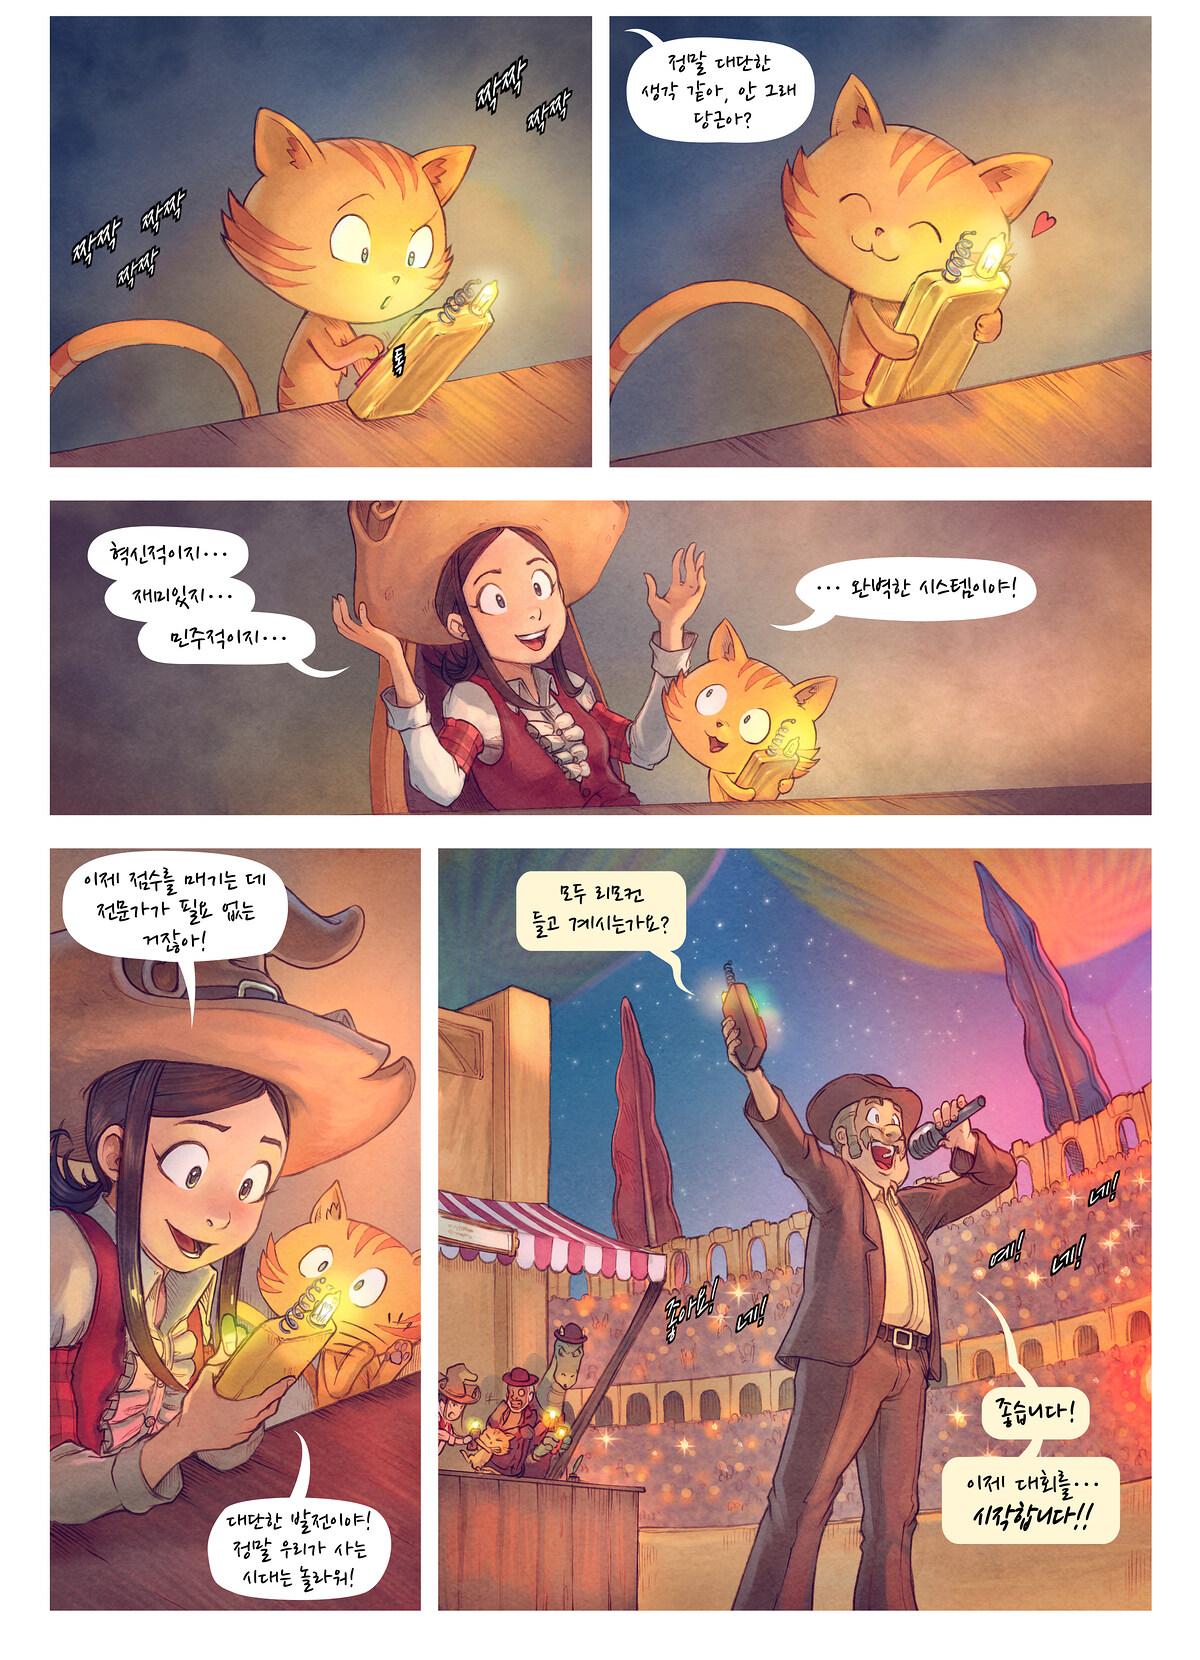 A webcomic page of Pepper&Carrot, 에피소드 22 [kr], 페이지 4